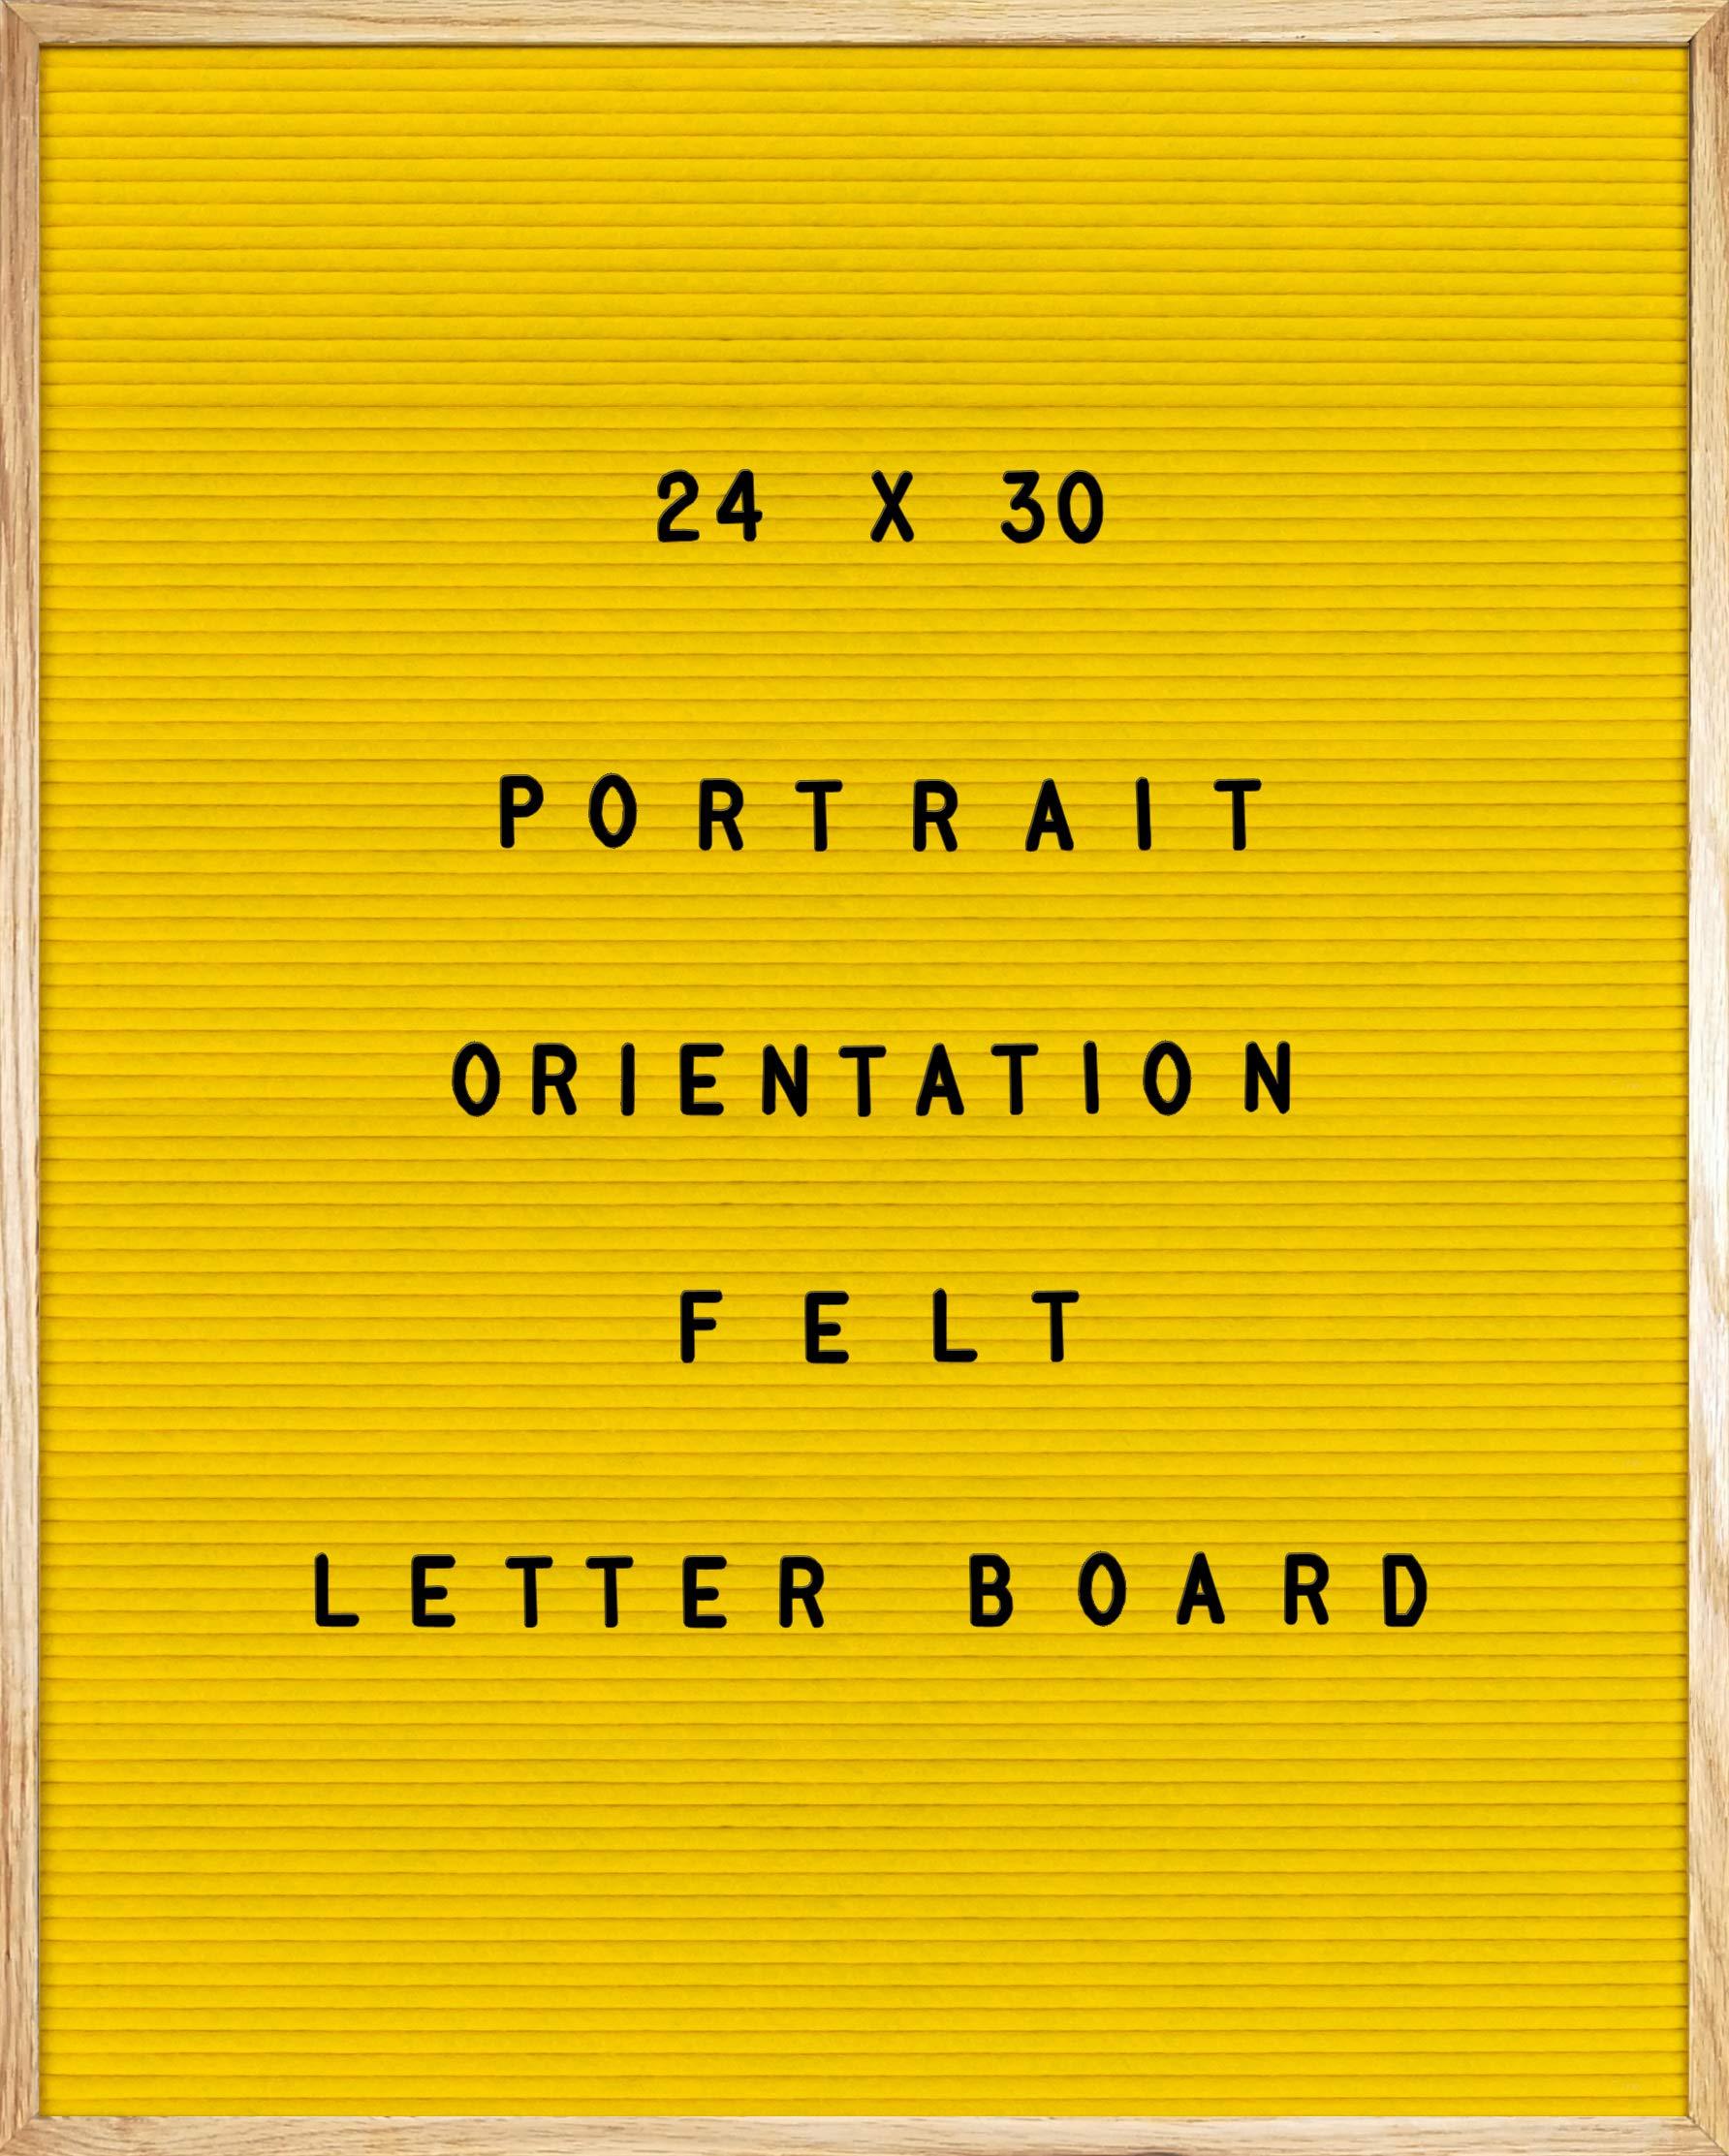 Yellow Felt Letter Board 24 X 30 Portrait Orientation with 692-Piece Set of 1'' and 3/4'' Letters, Symbols & Emojis, 36 Slot Set Organizer, Cutters, 2 Letter Pouches